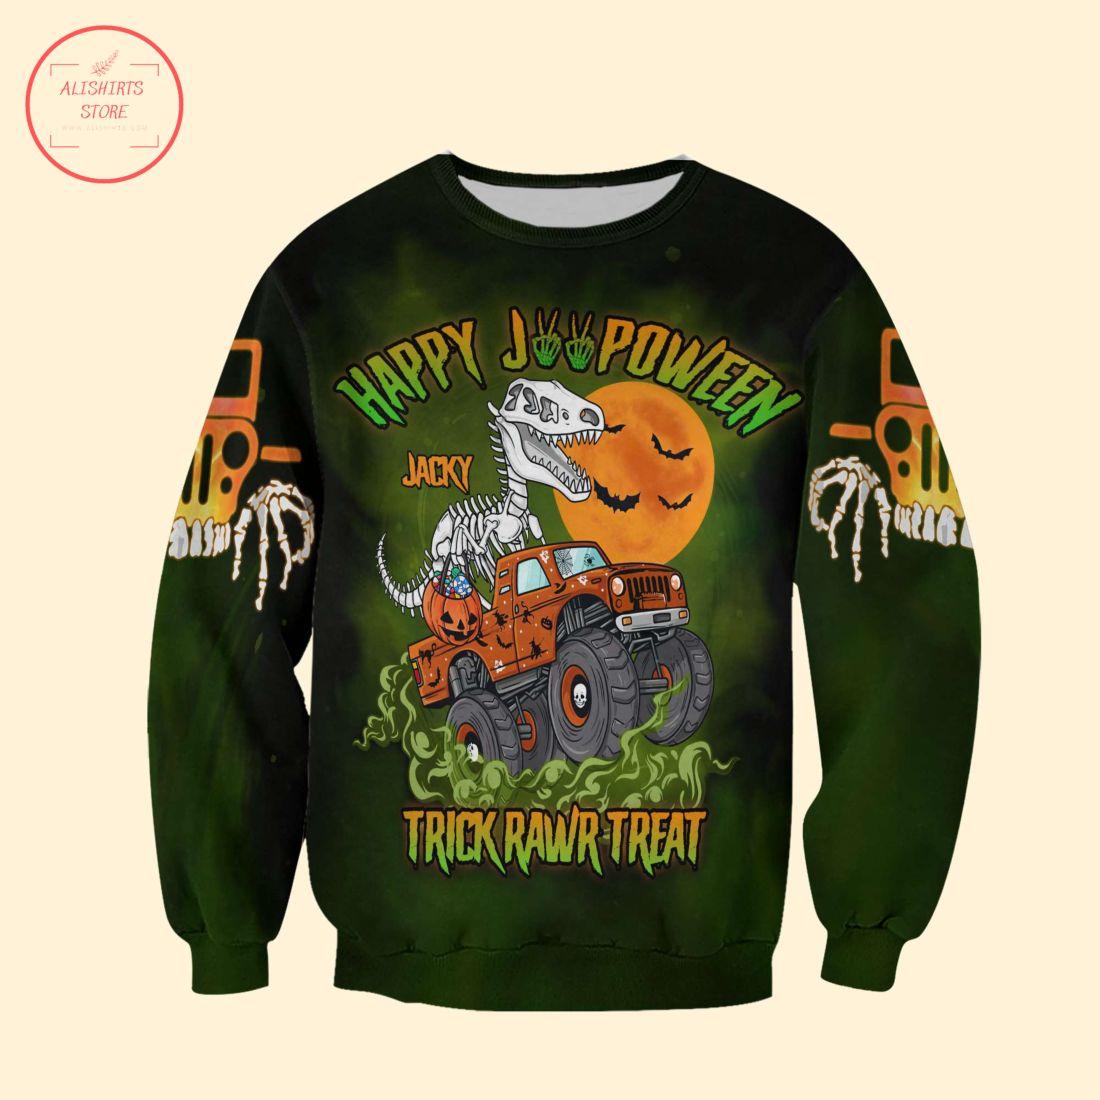 Dinosaur Sekeleton Trick Rawr Treat Halloween Shirt